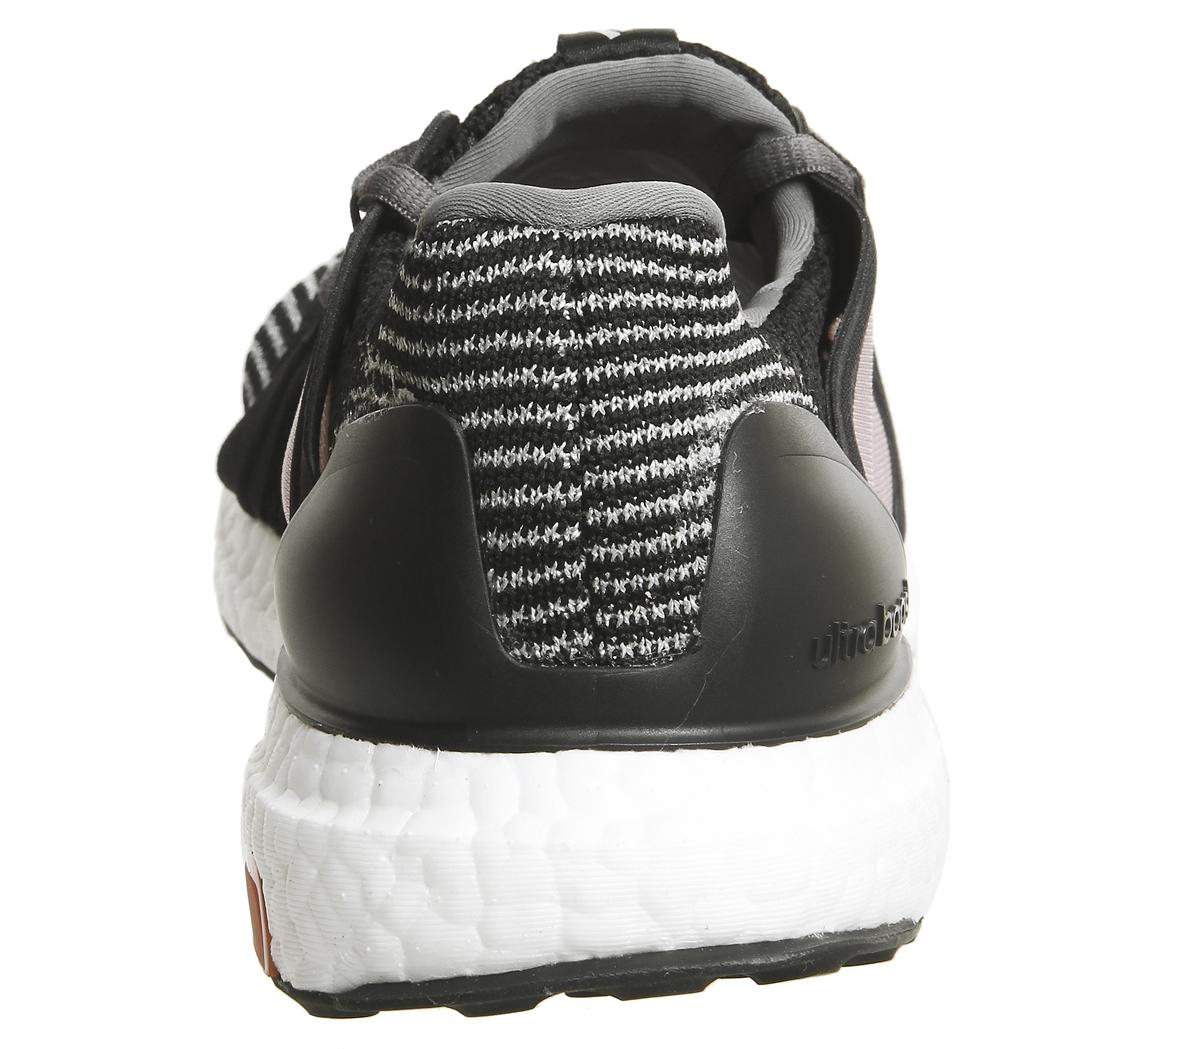 Boost nere Scarpe Scarpe da donna da Ultra Stella Adidas ginnastica wxwqz7ZXA